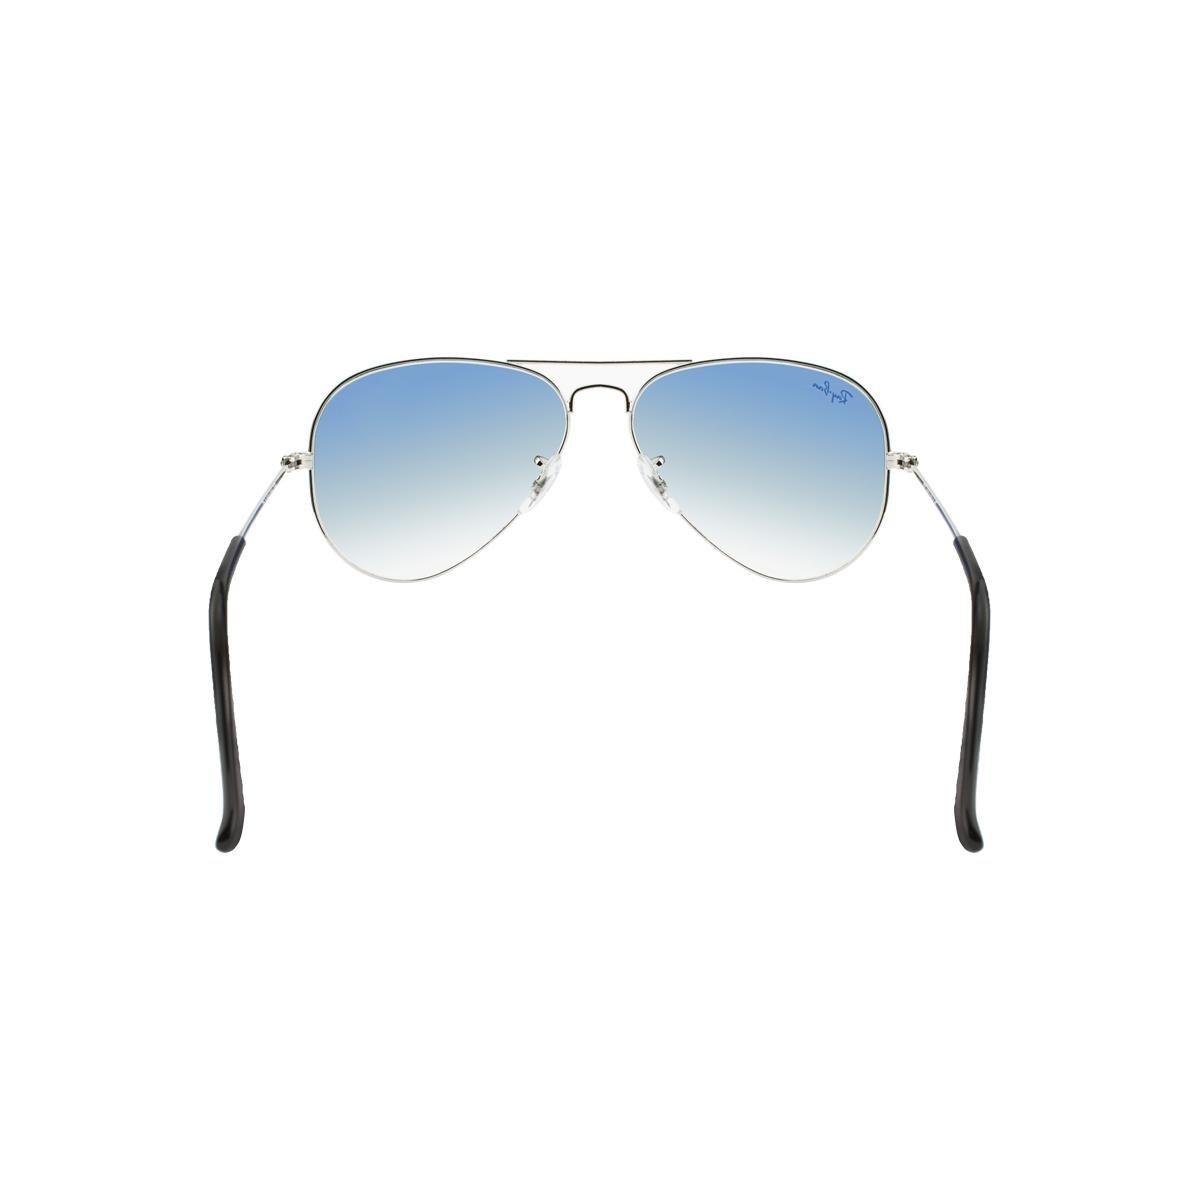 Óculos de Sol Ray-Ban Aviator RB3025 - 003-3F 55 - Compre Agora ... 44bdd16921